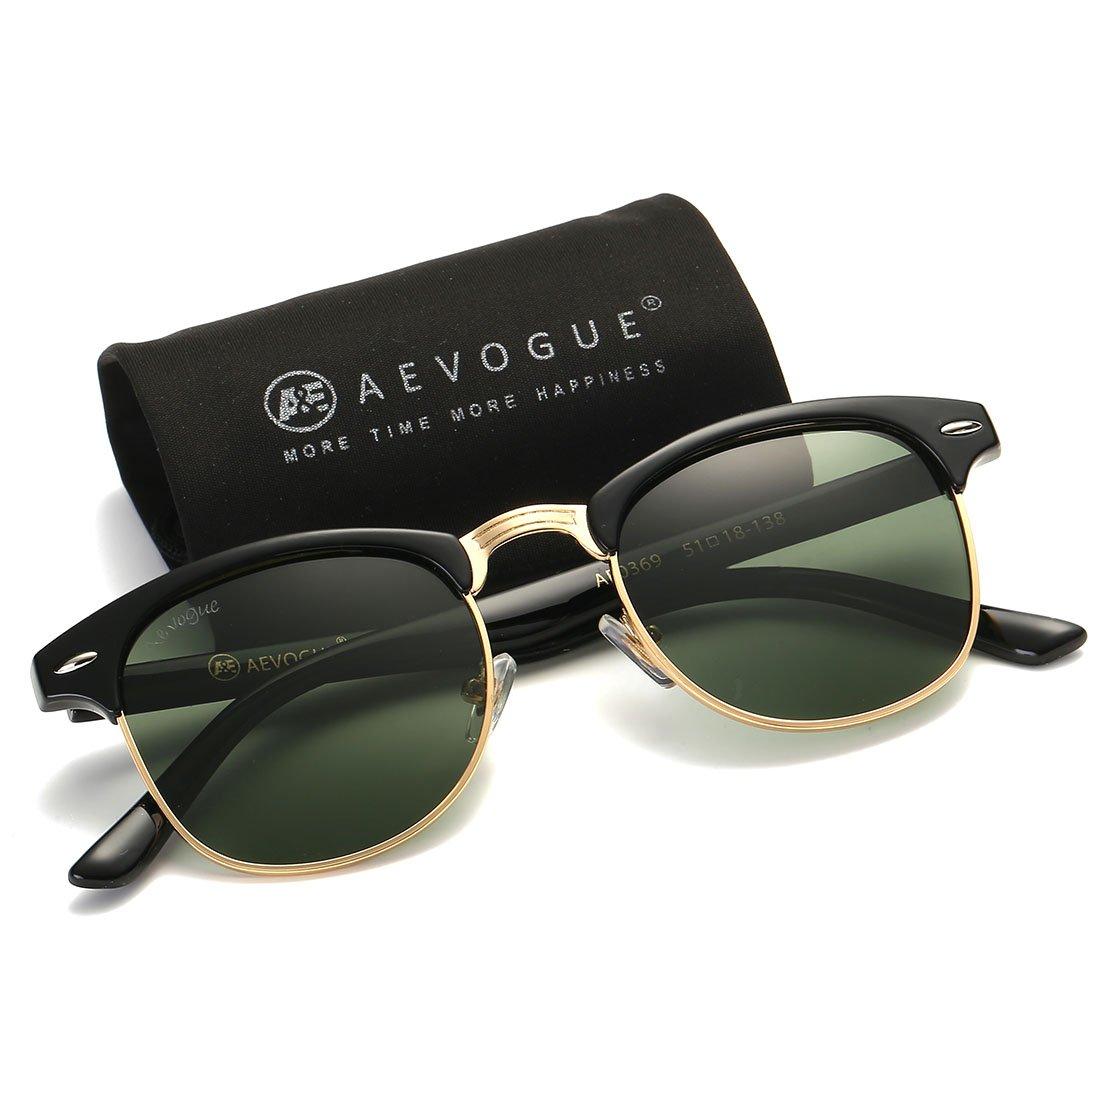 AEVOGUE Polarized Sunglasses Semi-Rimless Frame Brand Designer Classic AE0369 (Black&G15, 48)